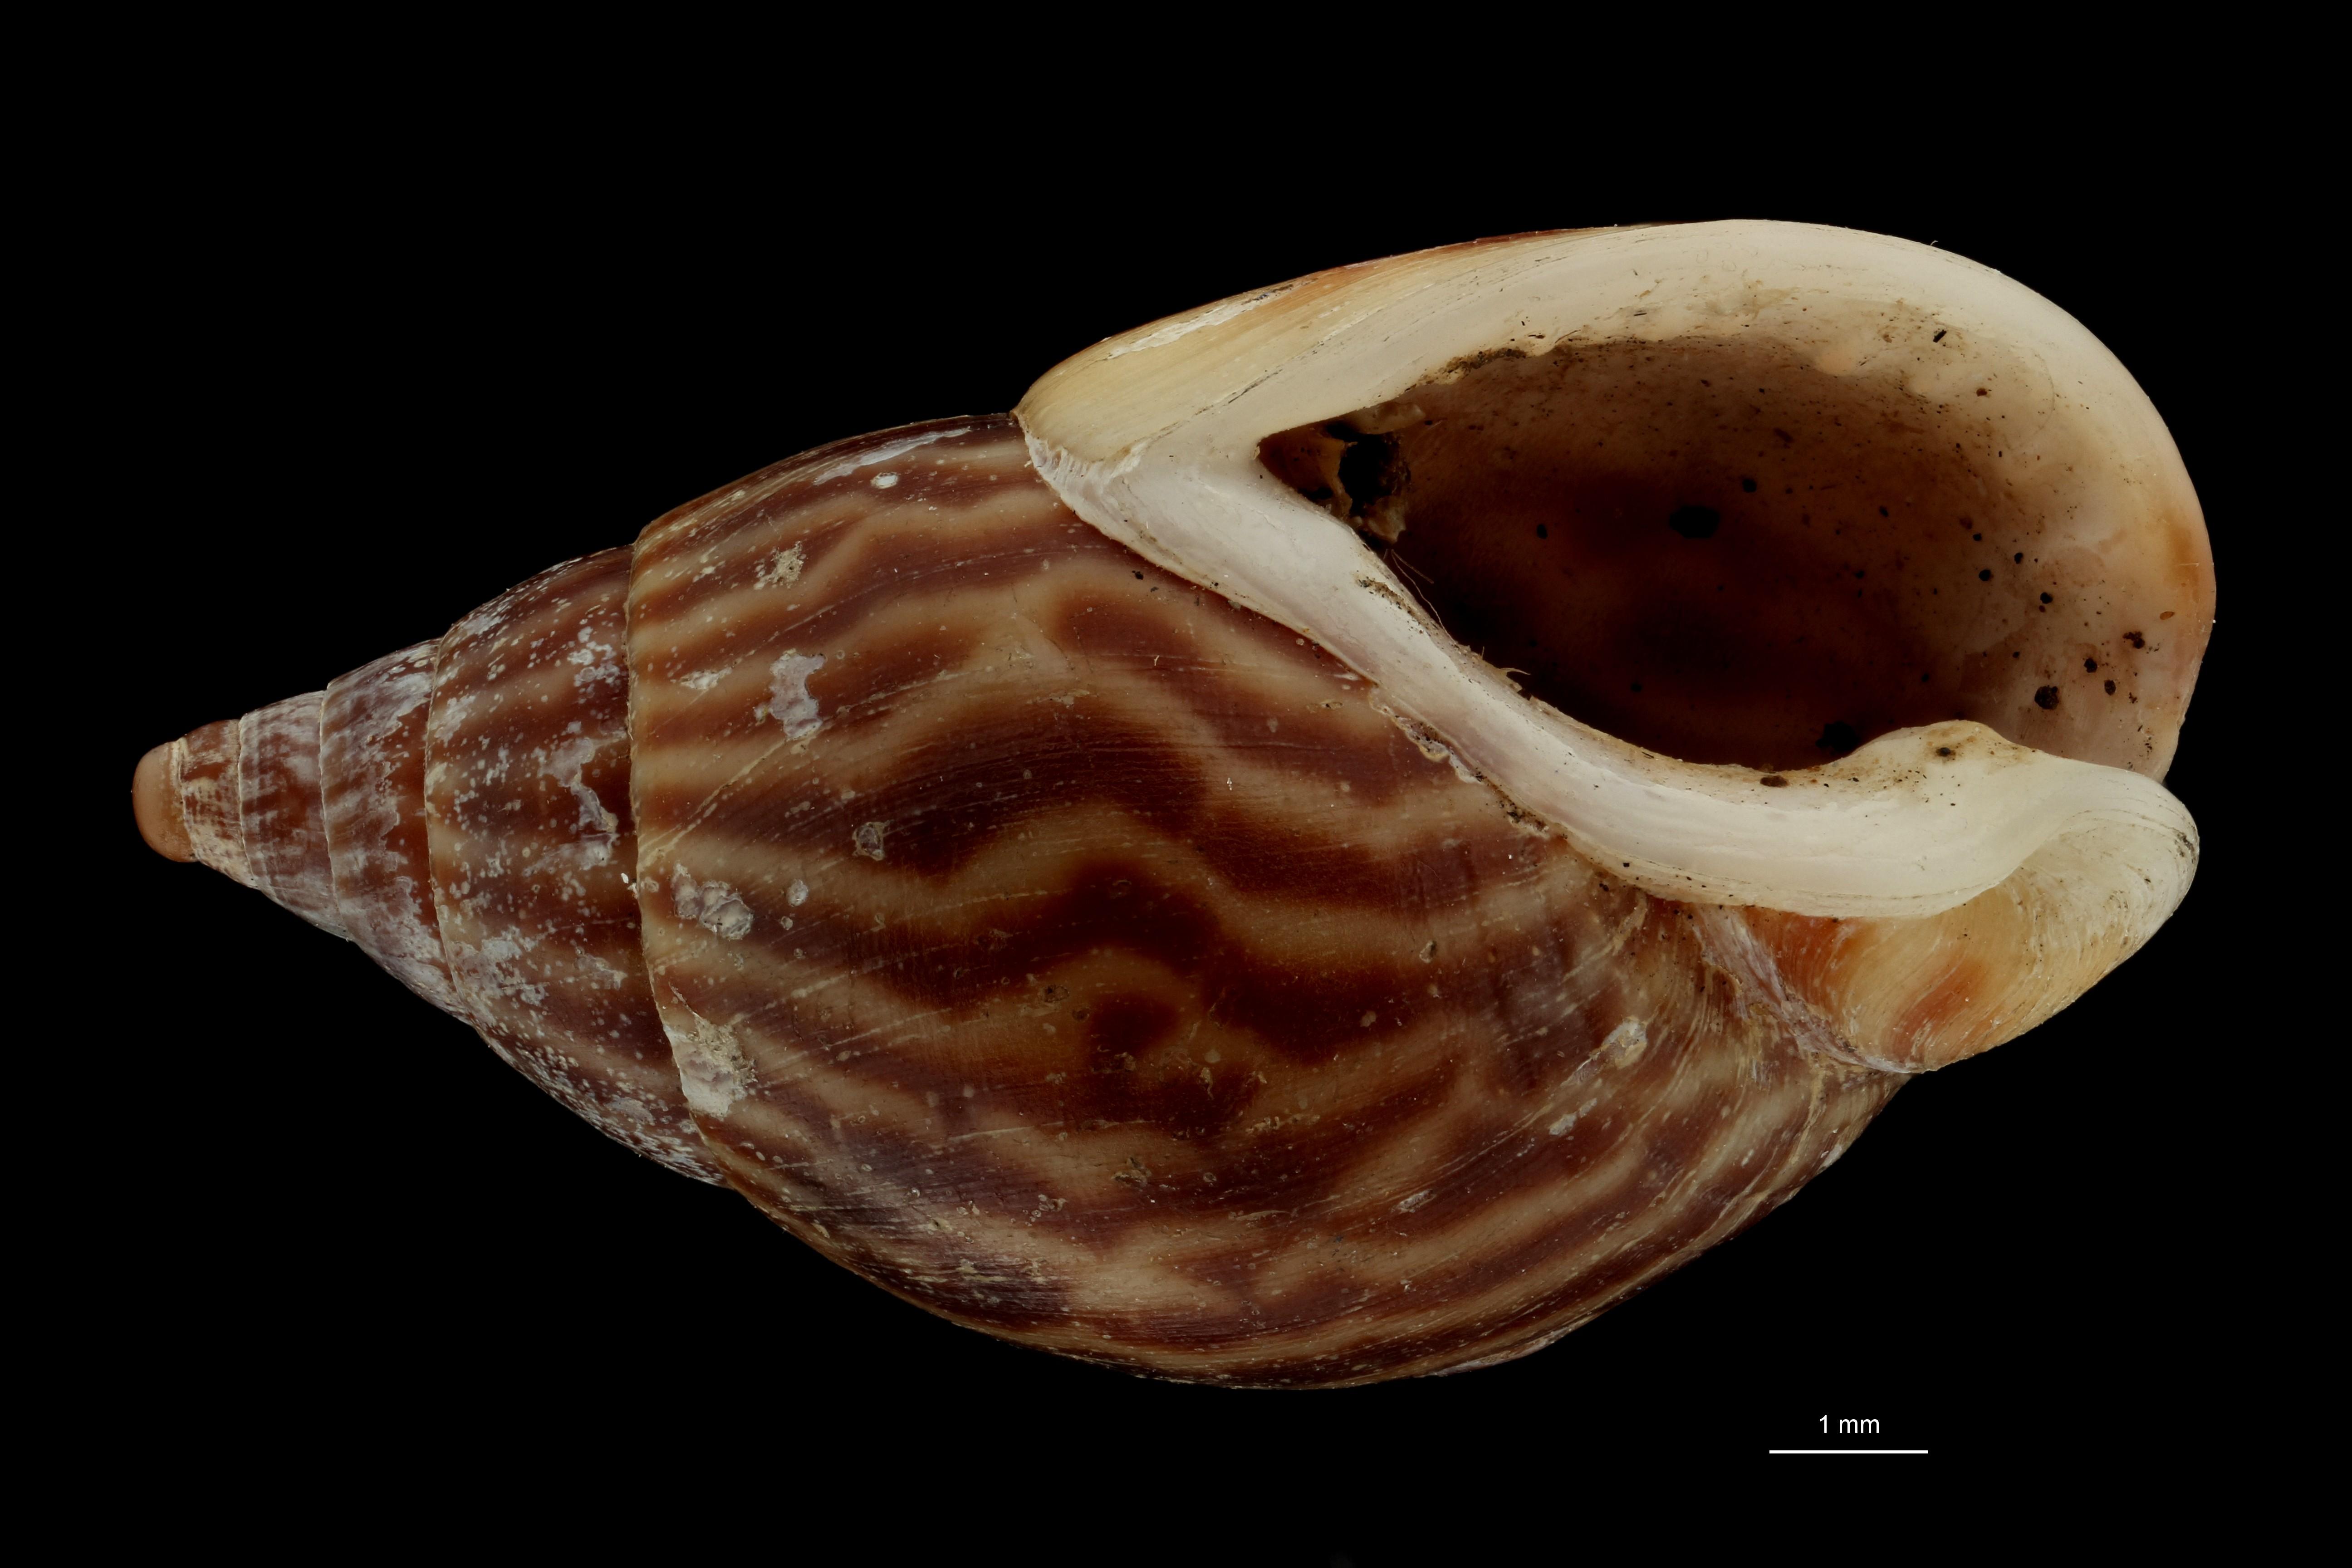 BE-RBINS-INV MT 614 Amycla conspersa var. undulata Typ V ZS PMax Scaled.jpg